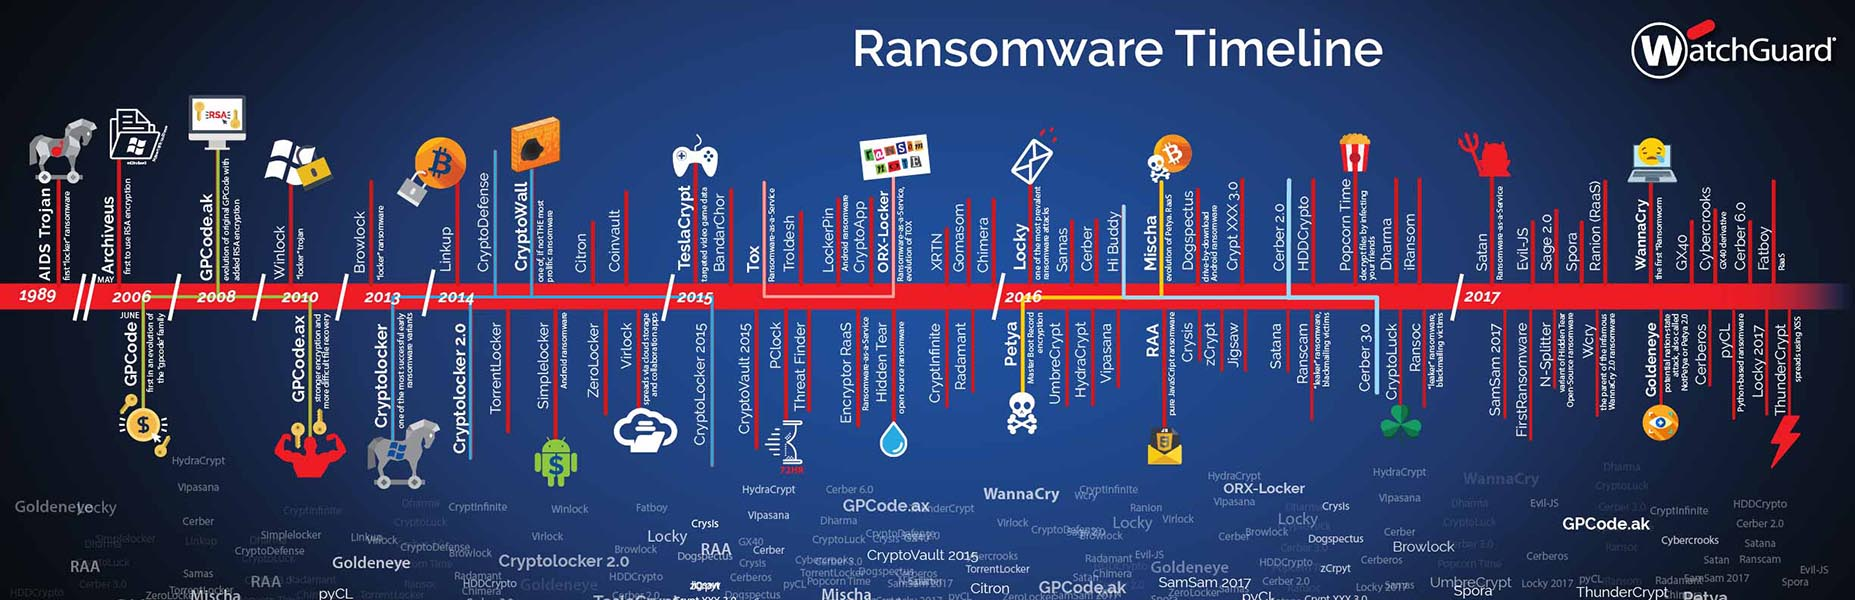 Image: Ransomware Timeline